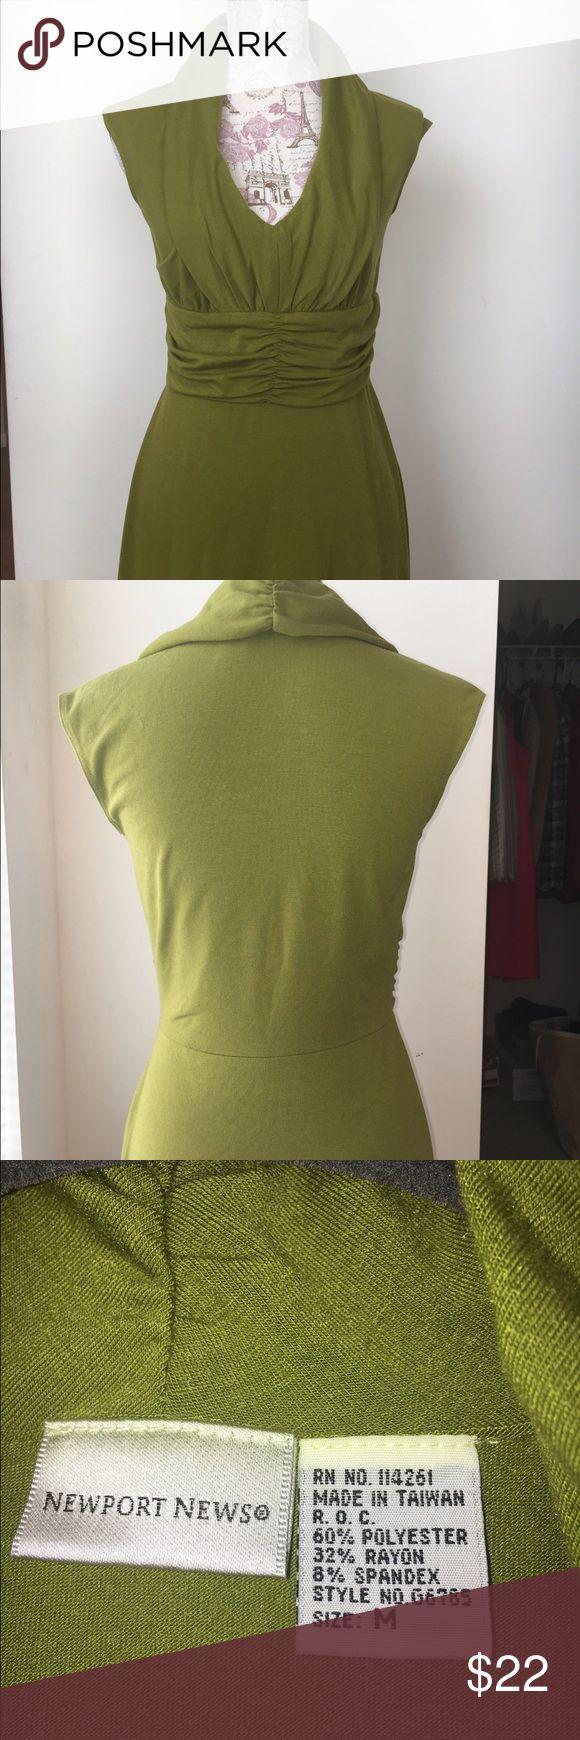 Dress Green dress polyester spandex long length not to floor fits nice! Newport News Dresses Midi